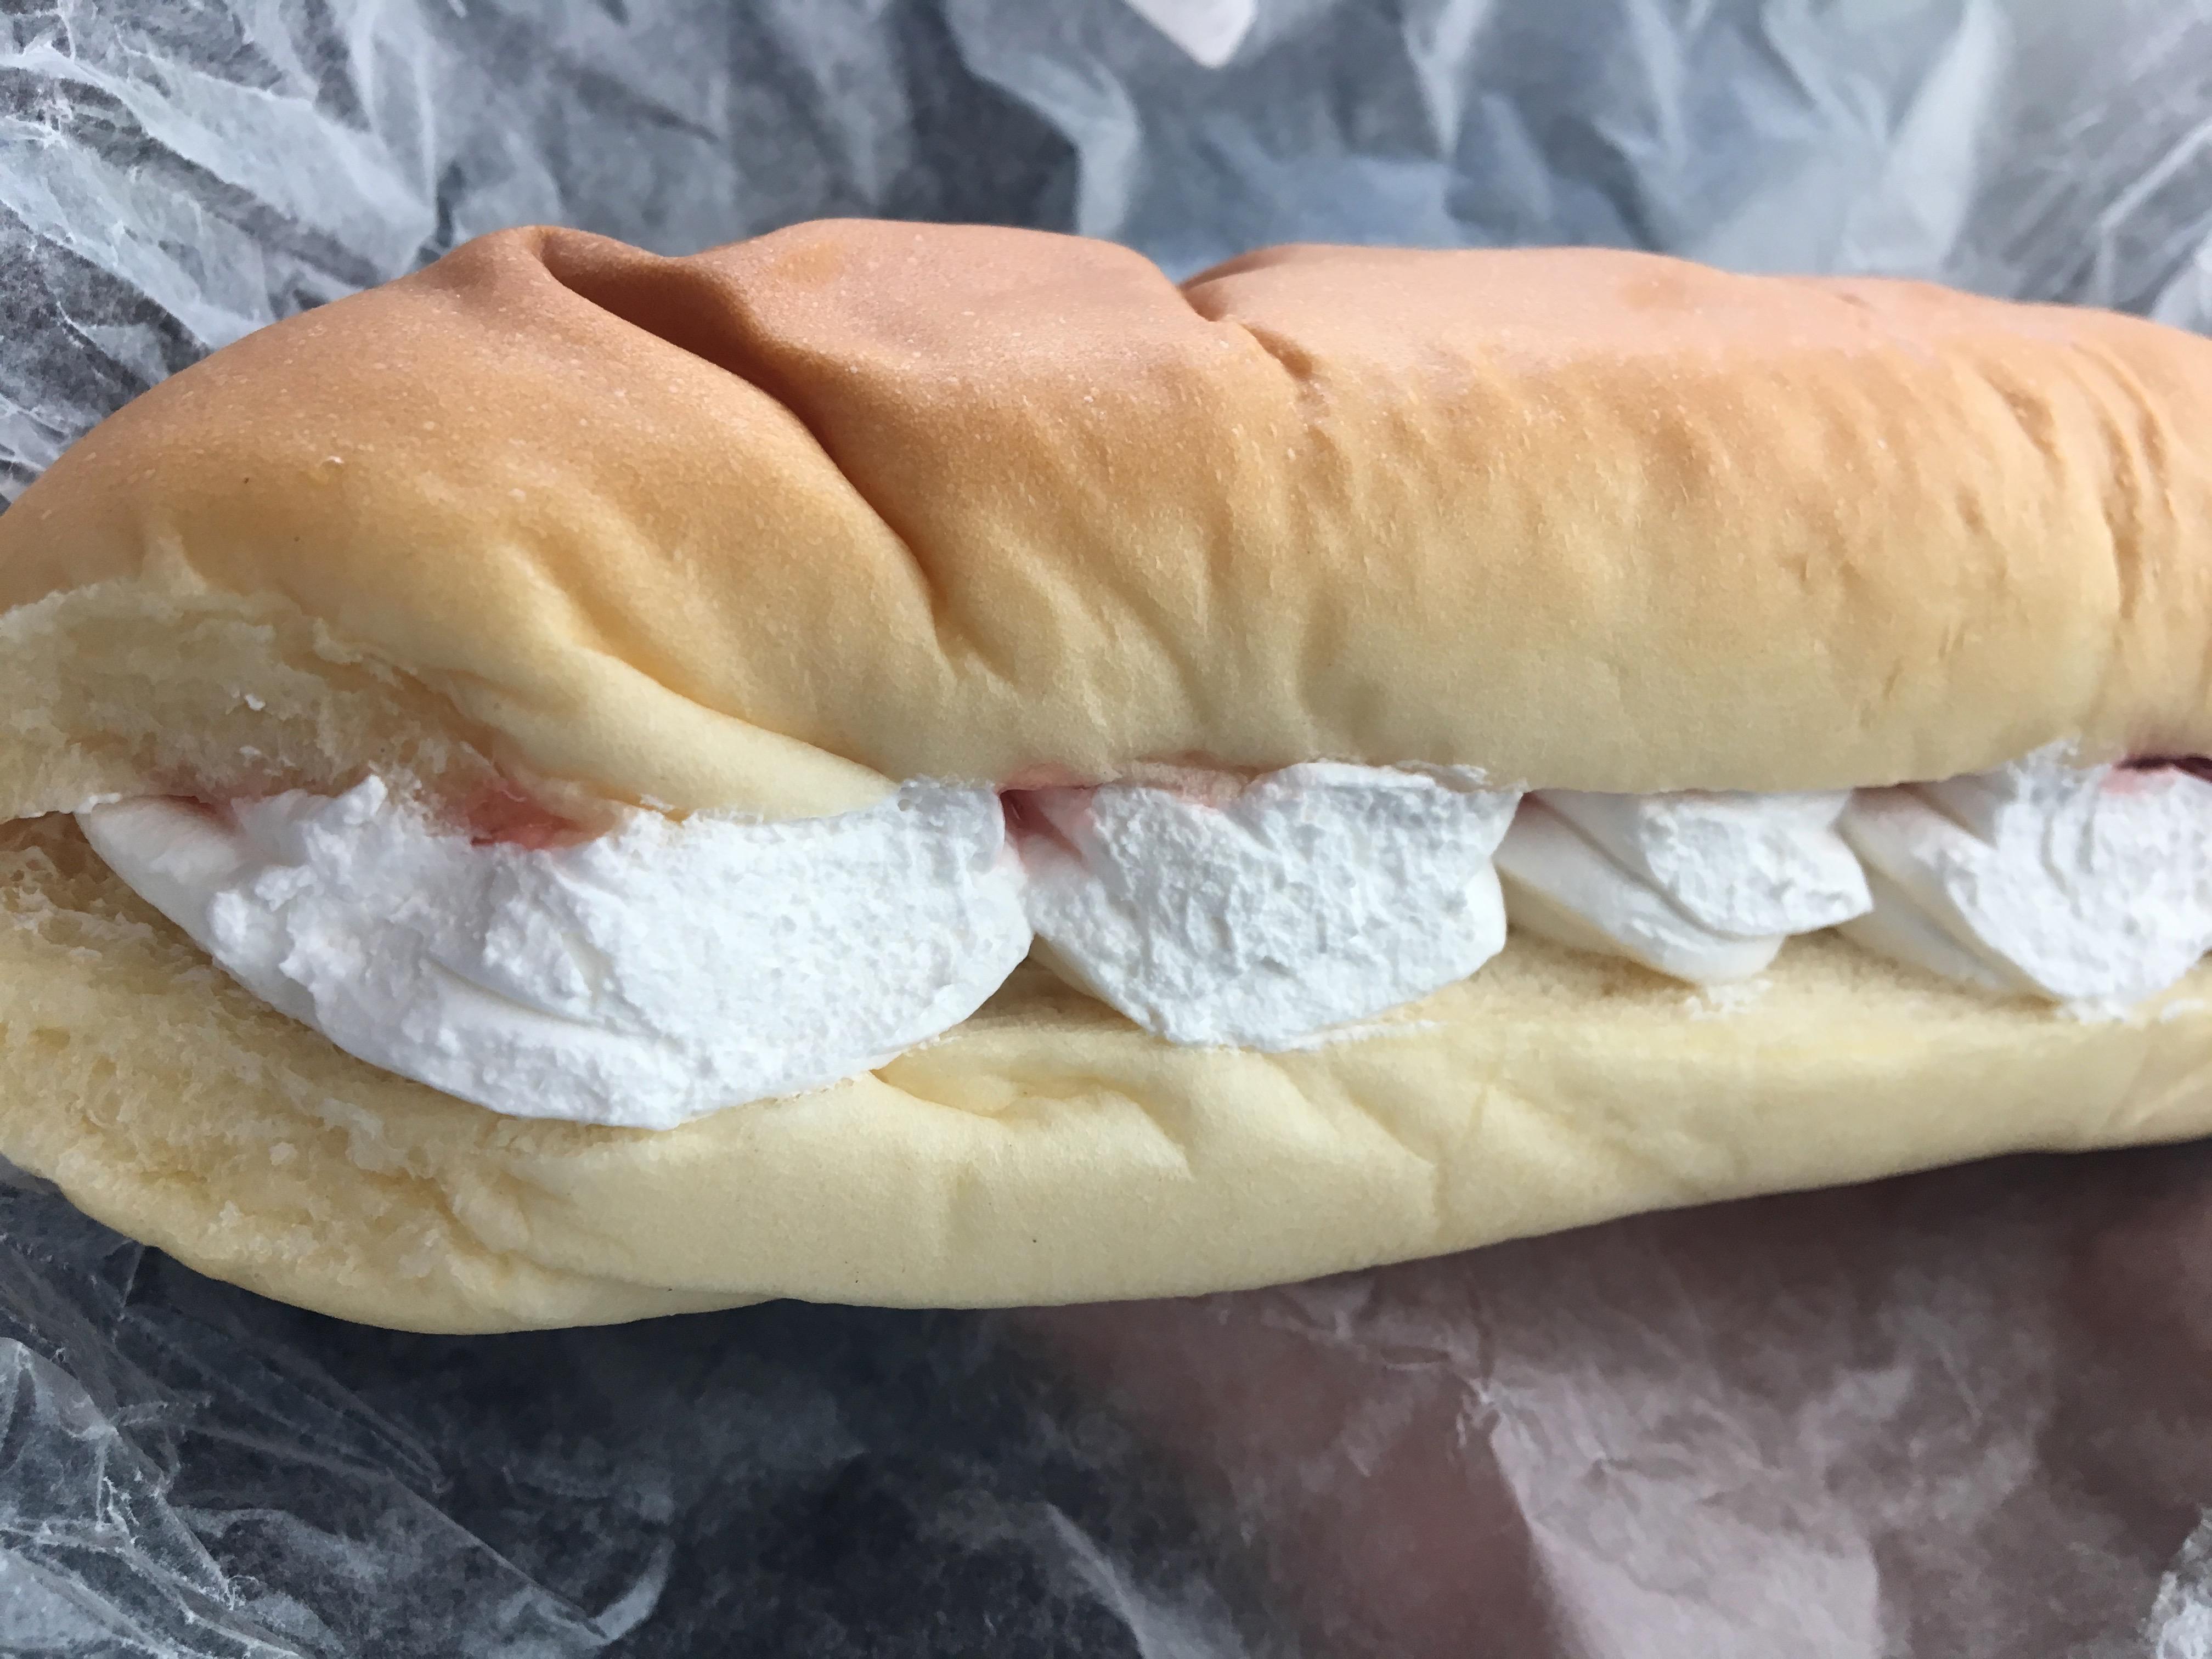 【DeLaCOPPE】鹿児島でブーム?なうのコッペパン屋さんが鹿児島市西田にオープン!